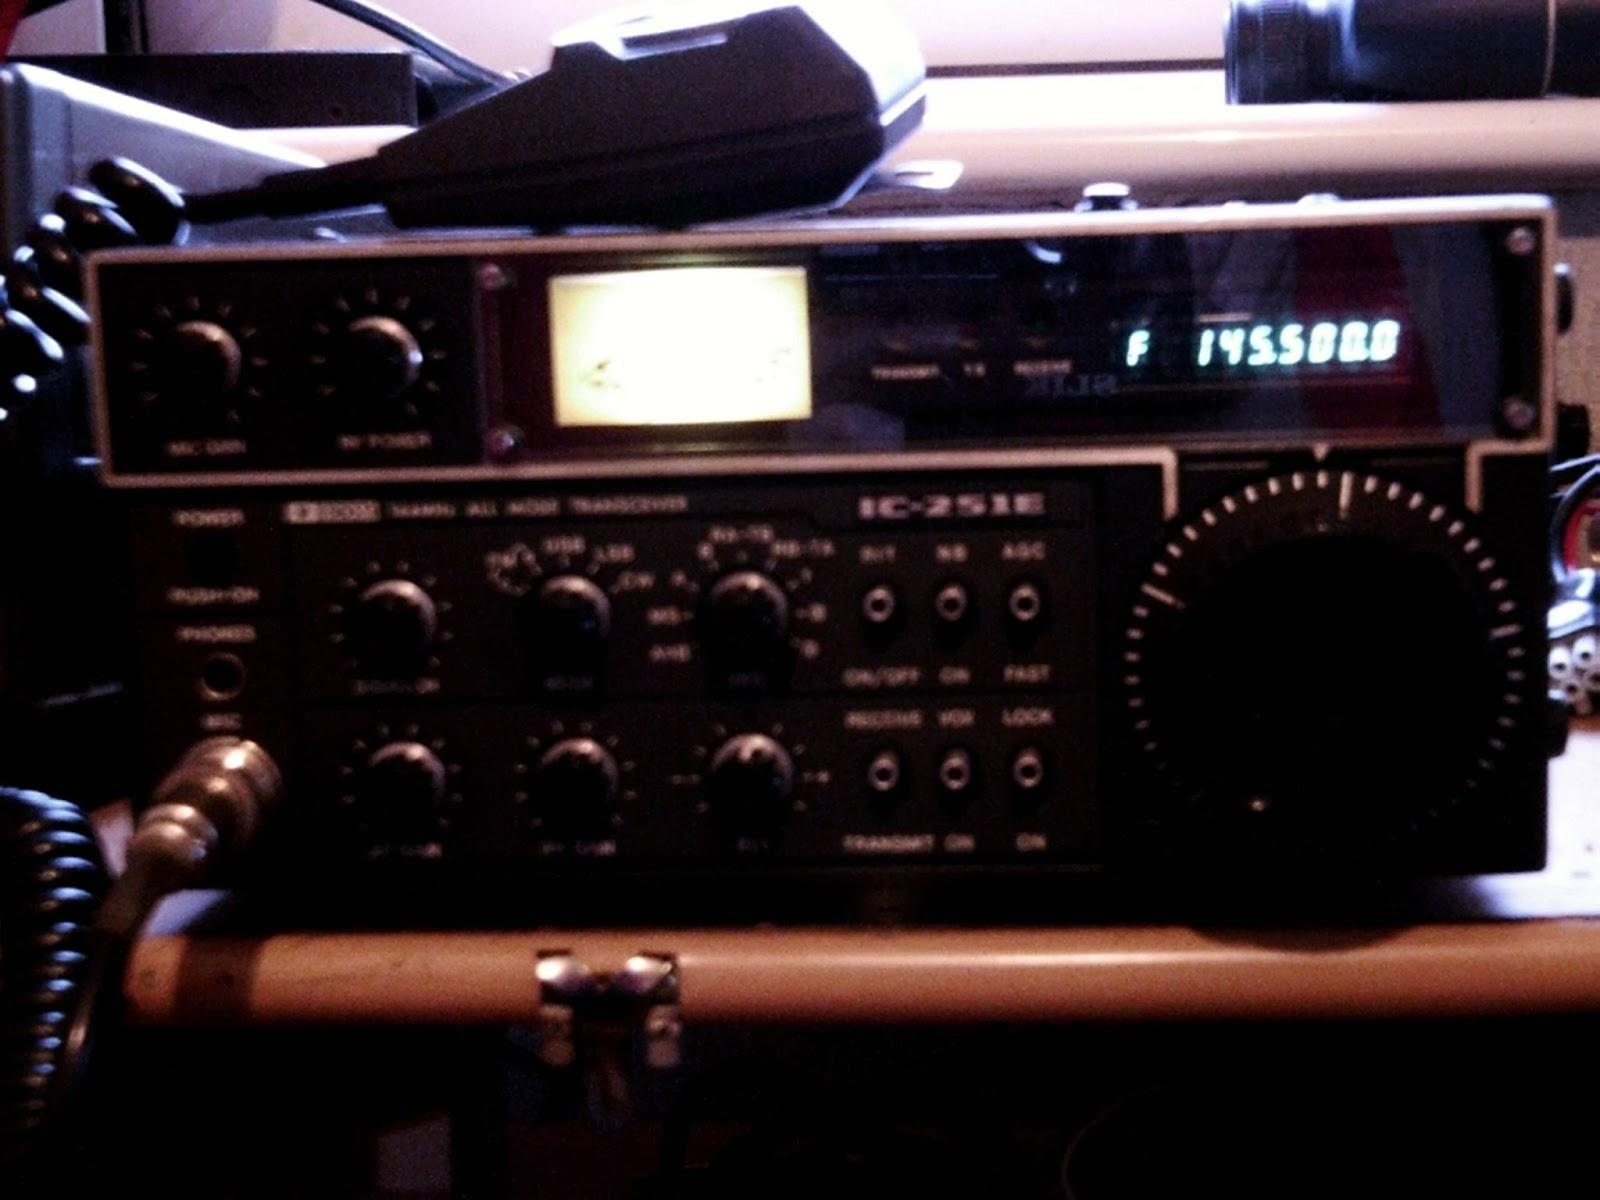 Ic 251a manual